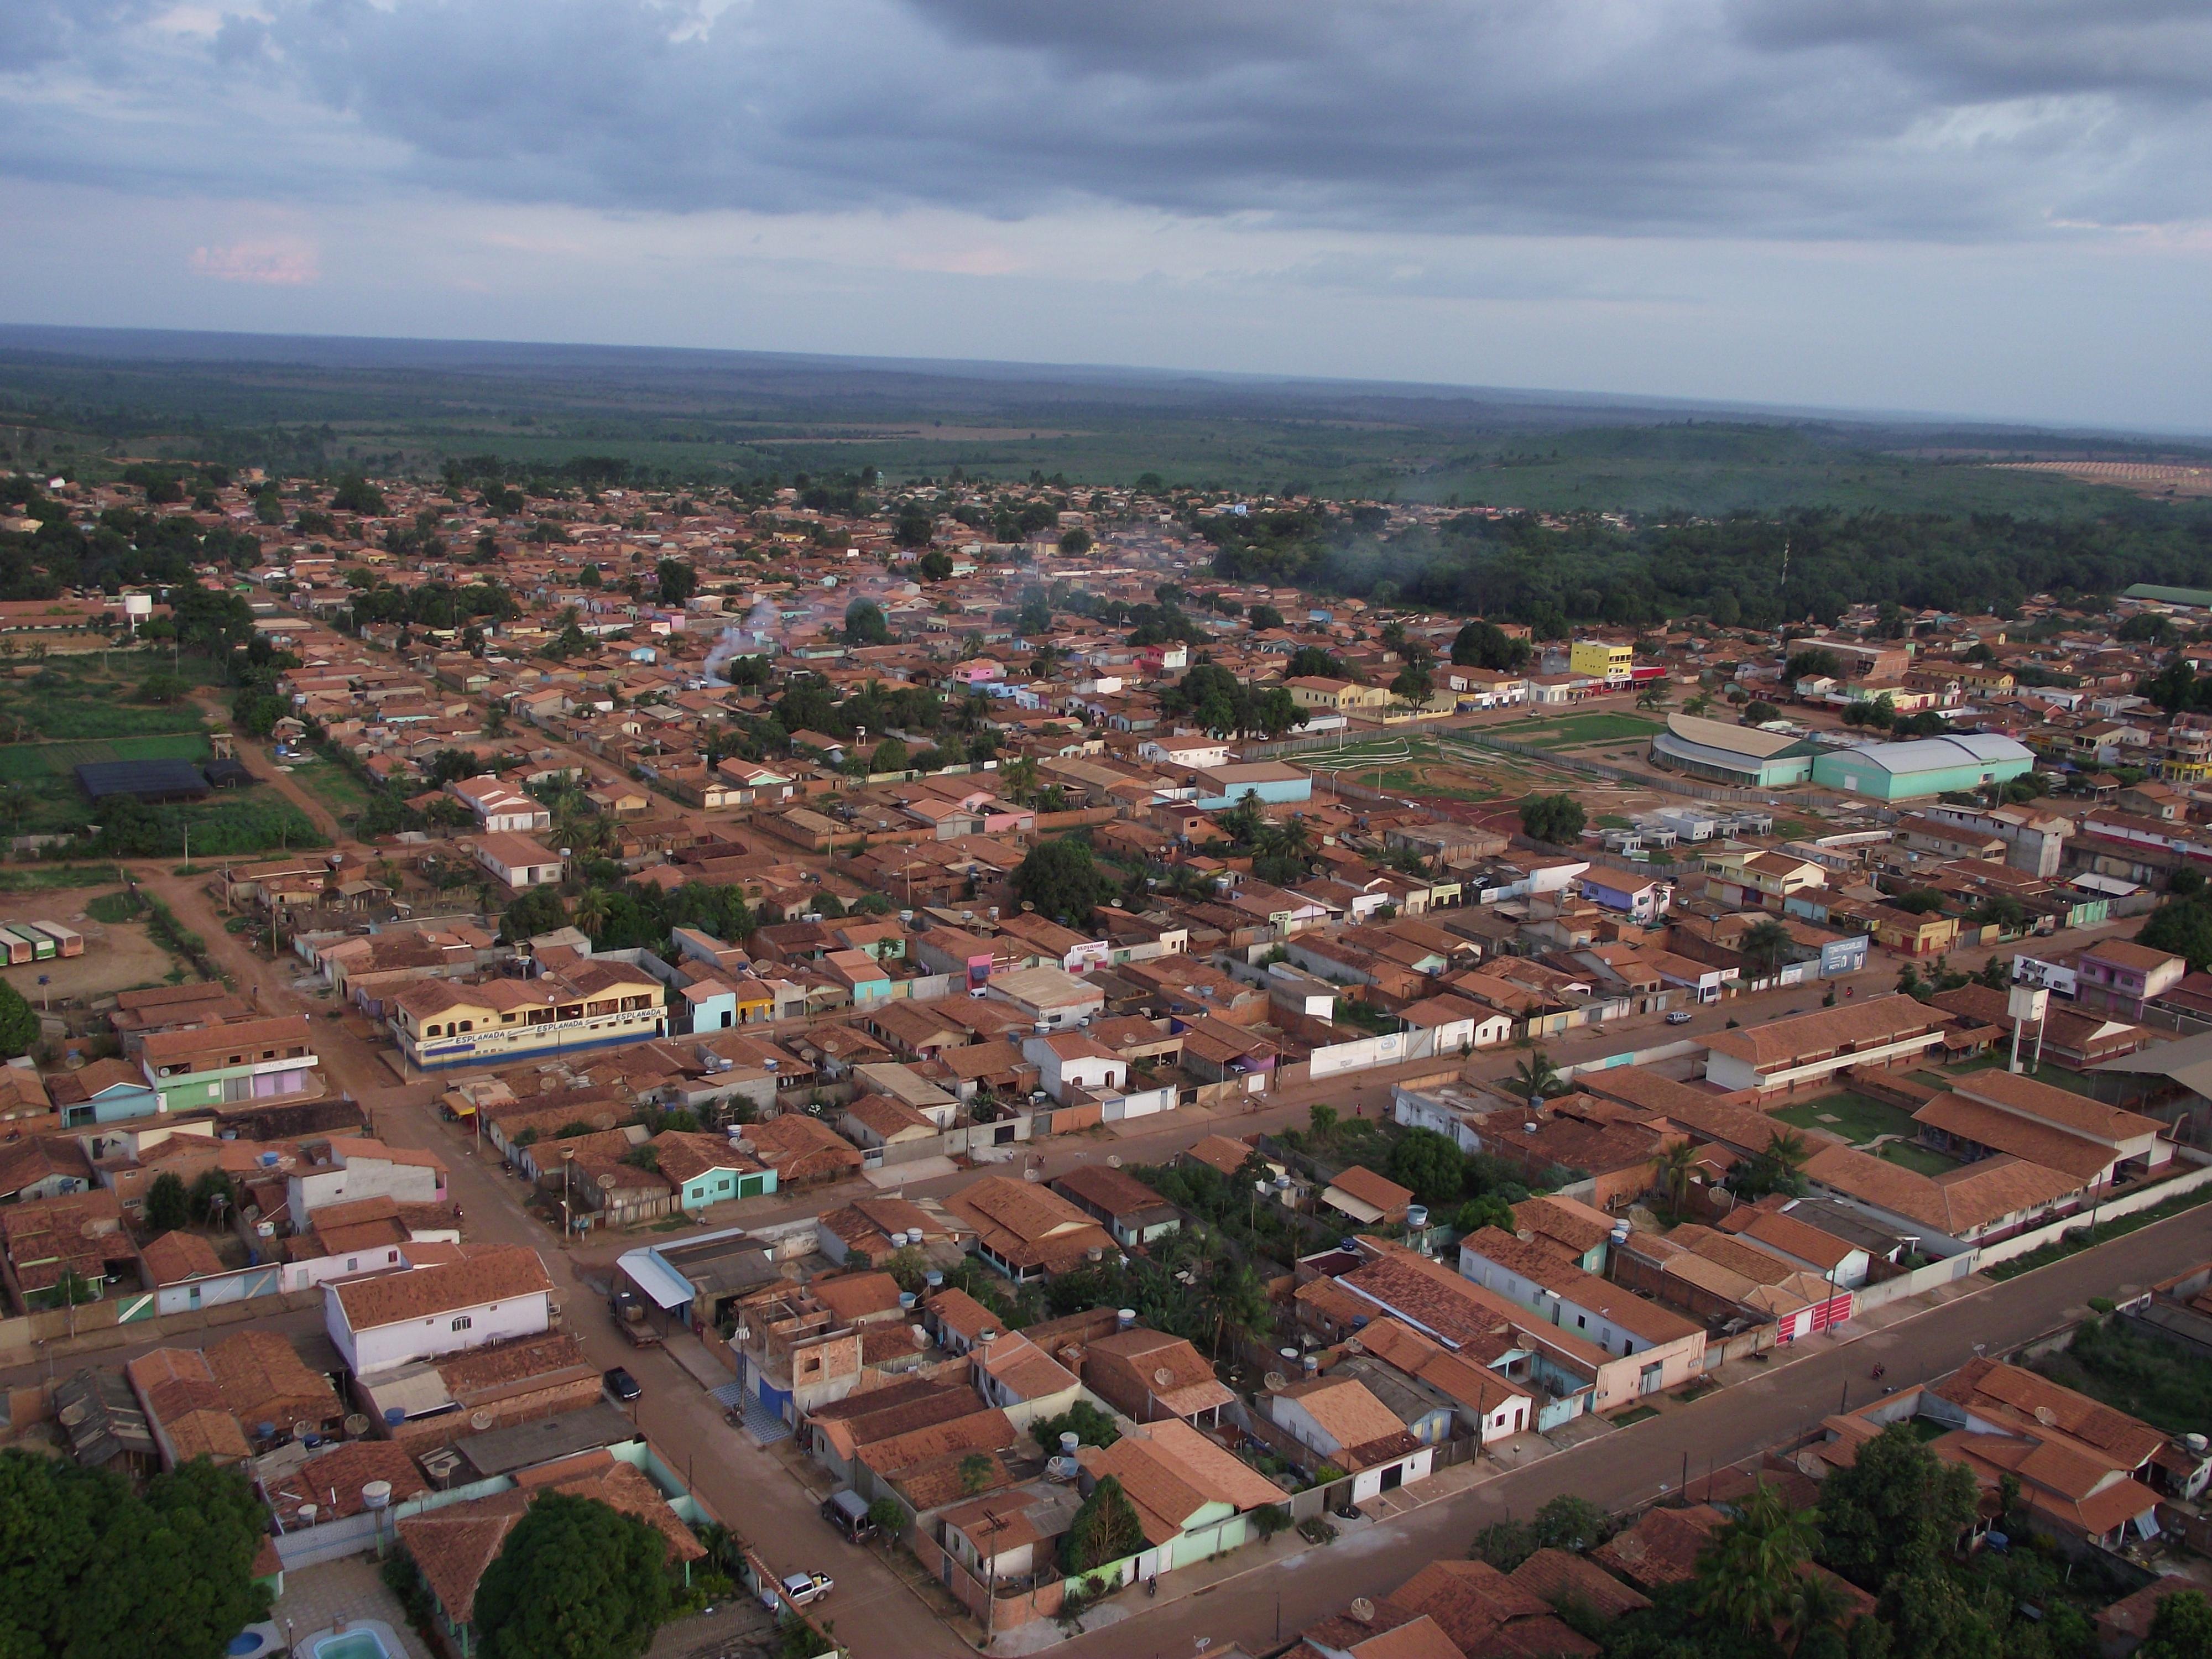 Dom Eliseu Pará fonte: upload.wikimedia.org